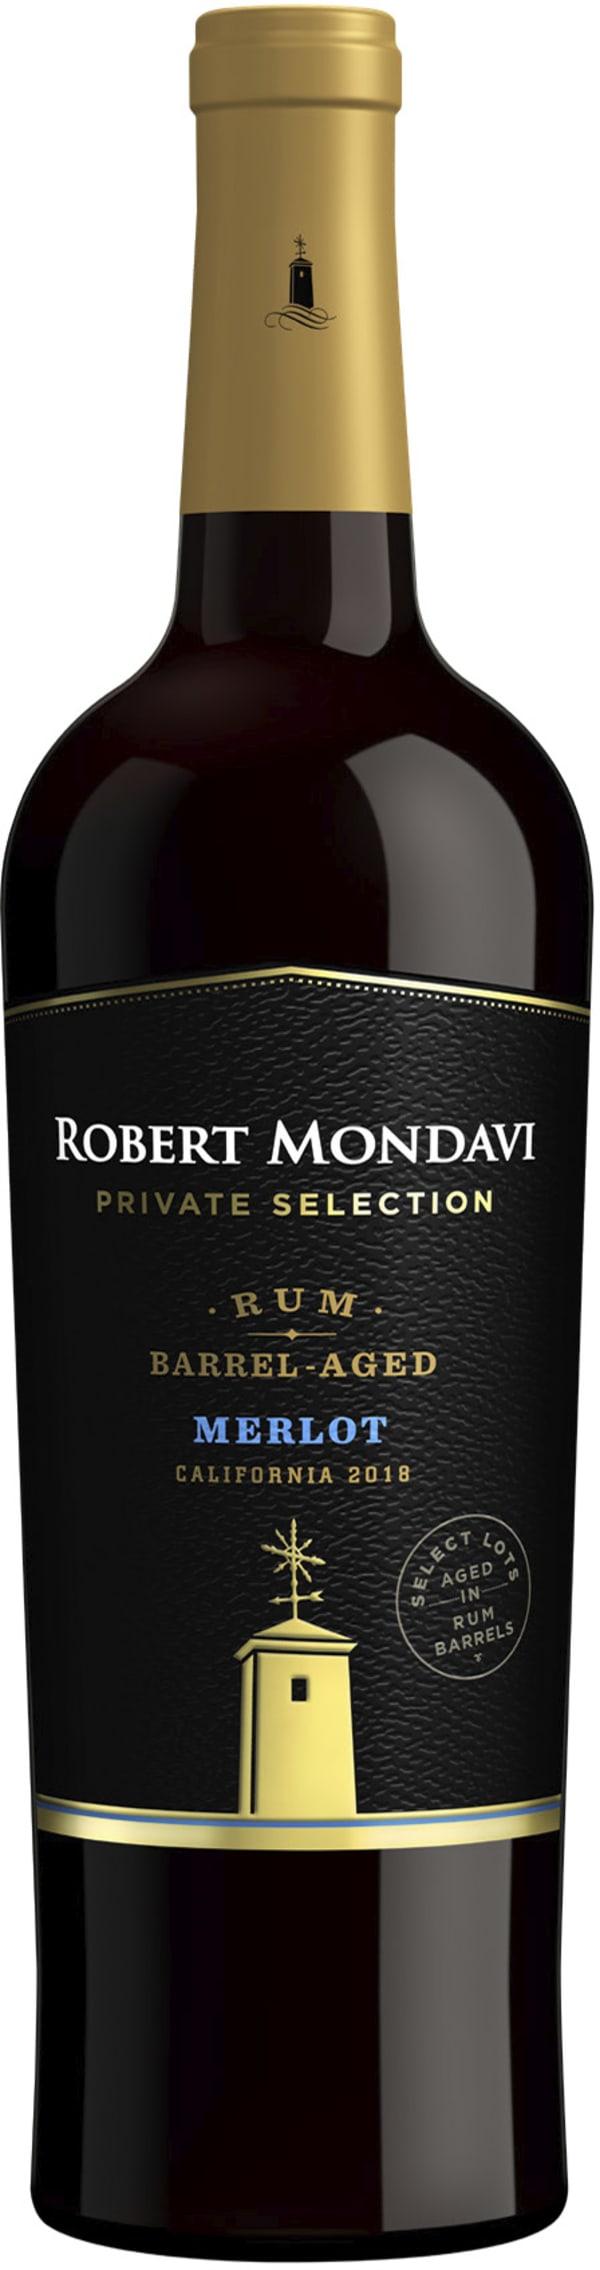 Robert Mondavi Rum Barrel-Aged Merlot 2018